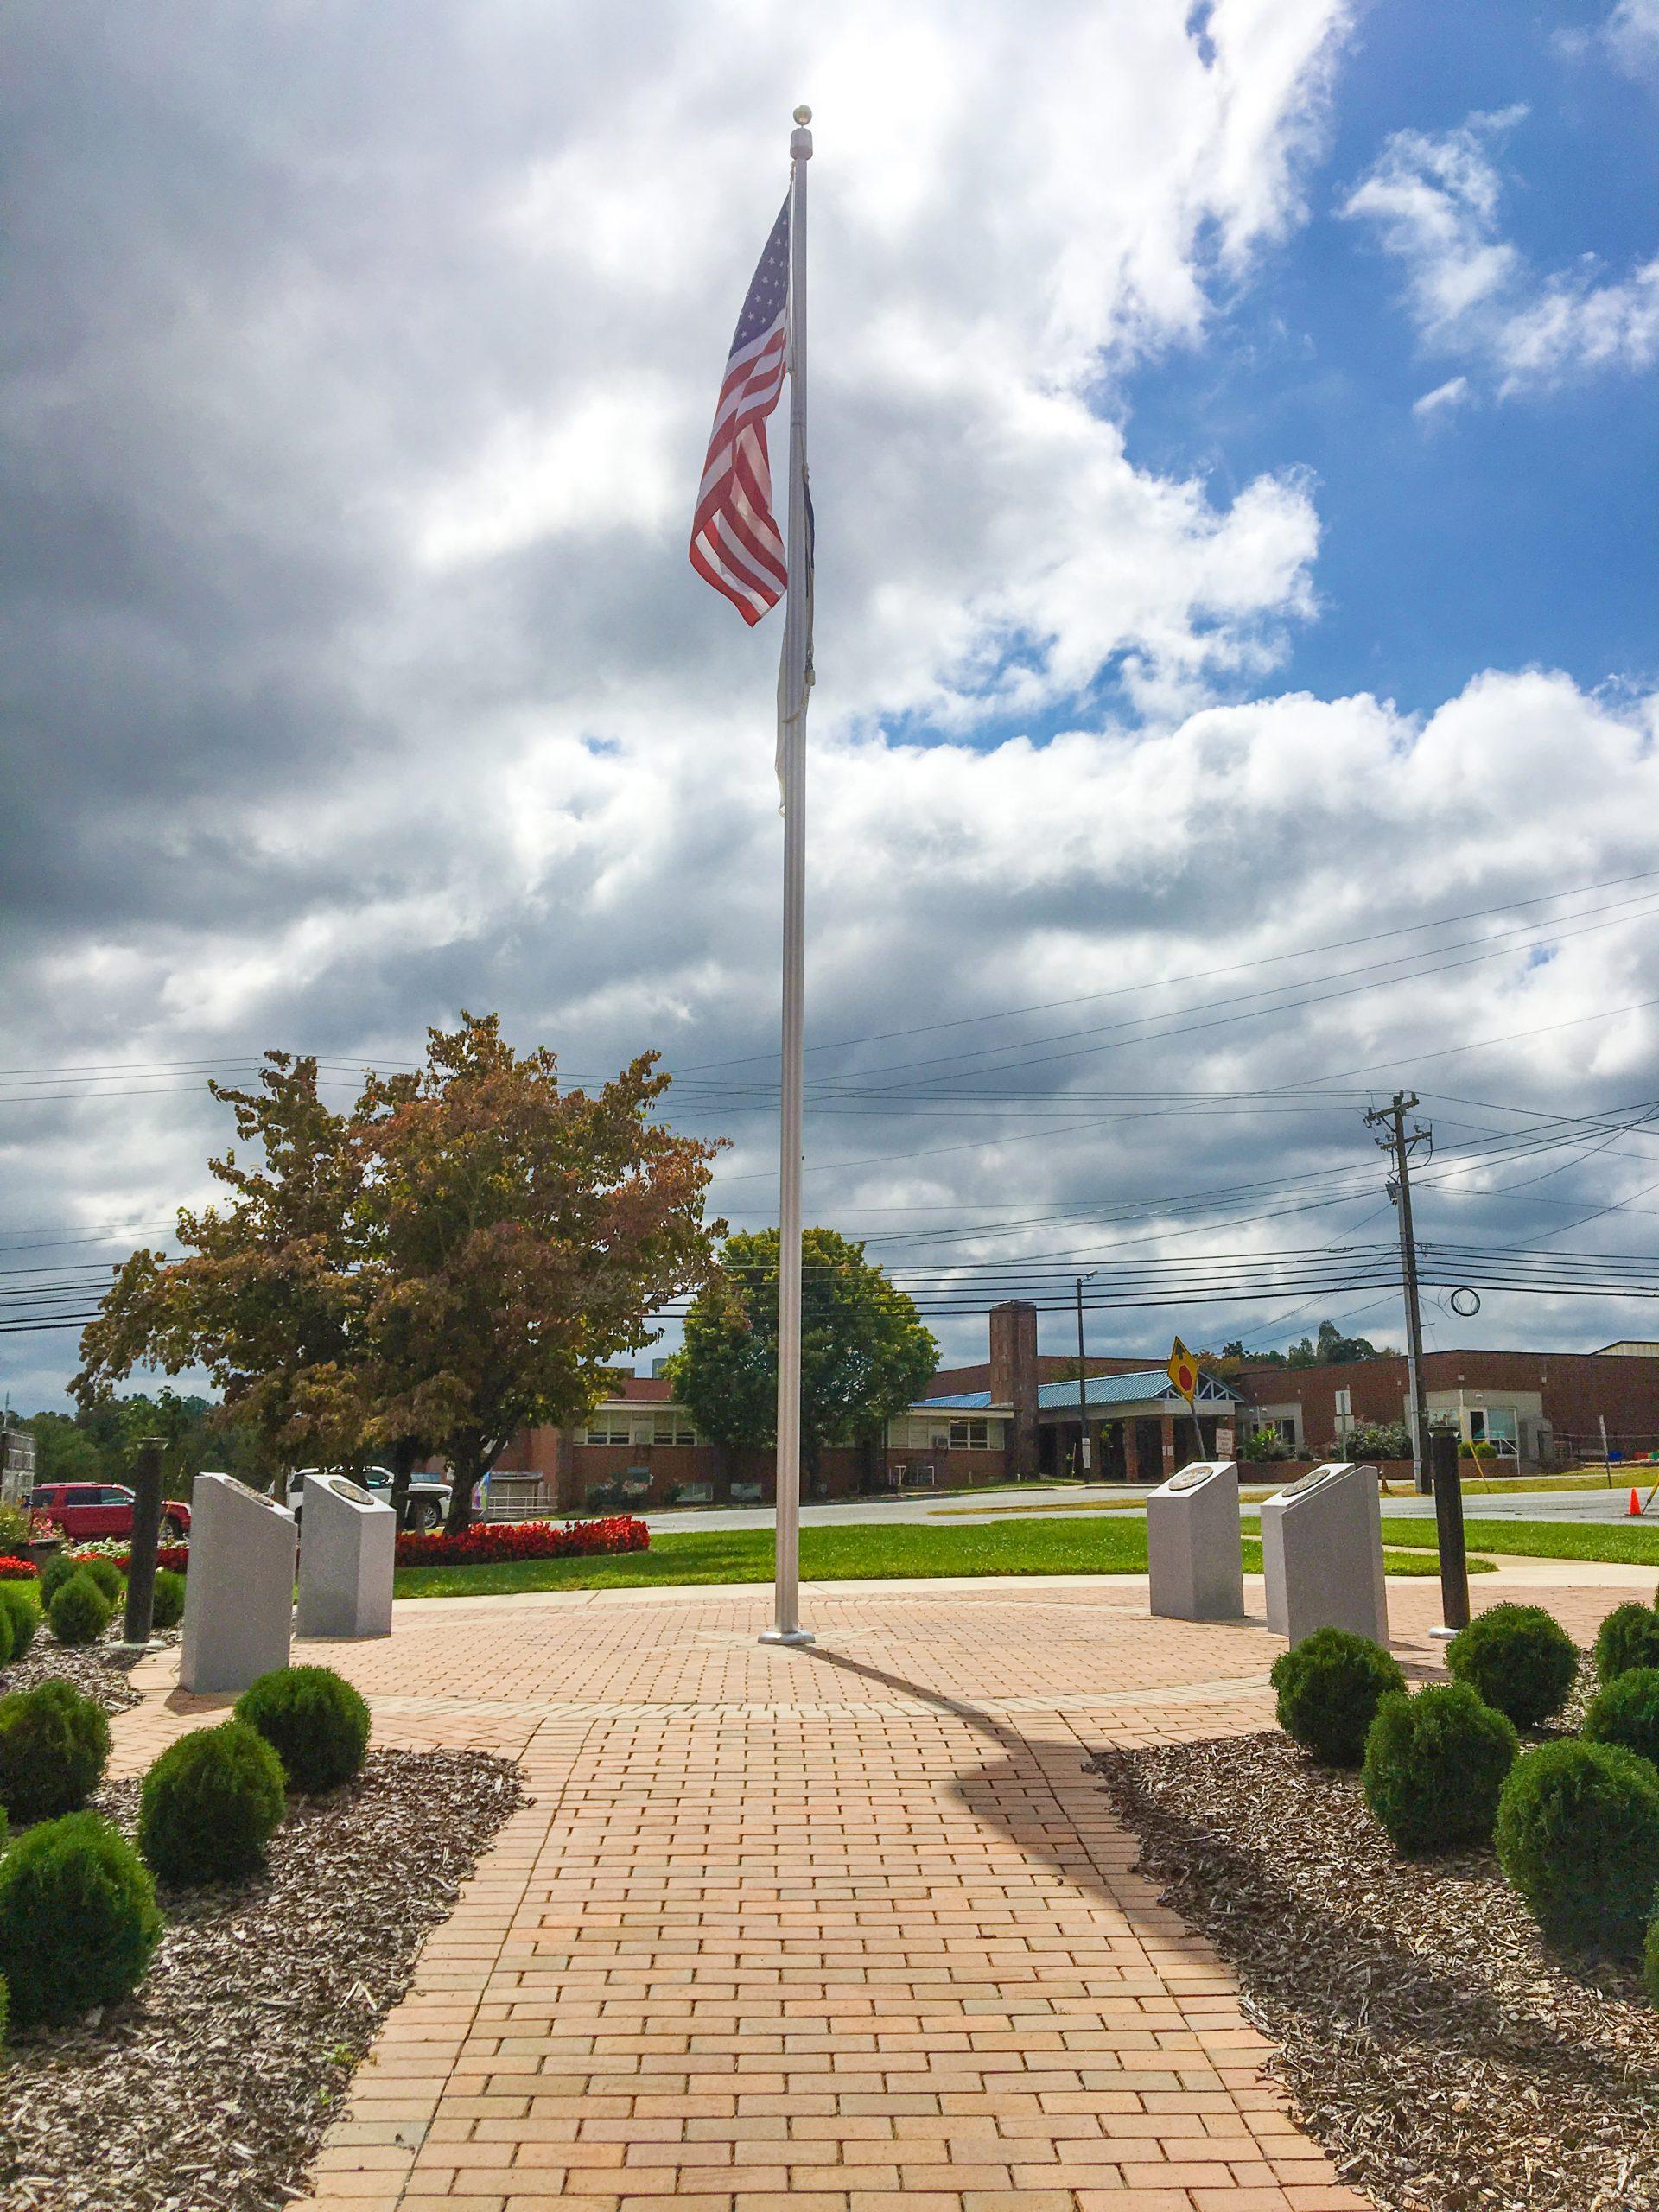 memorial garden pavers and flag